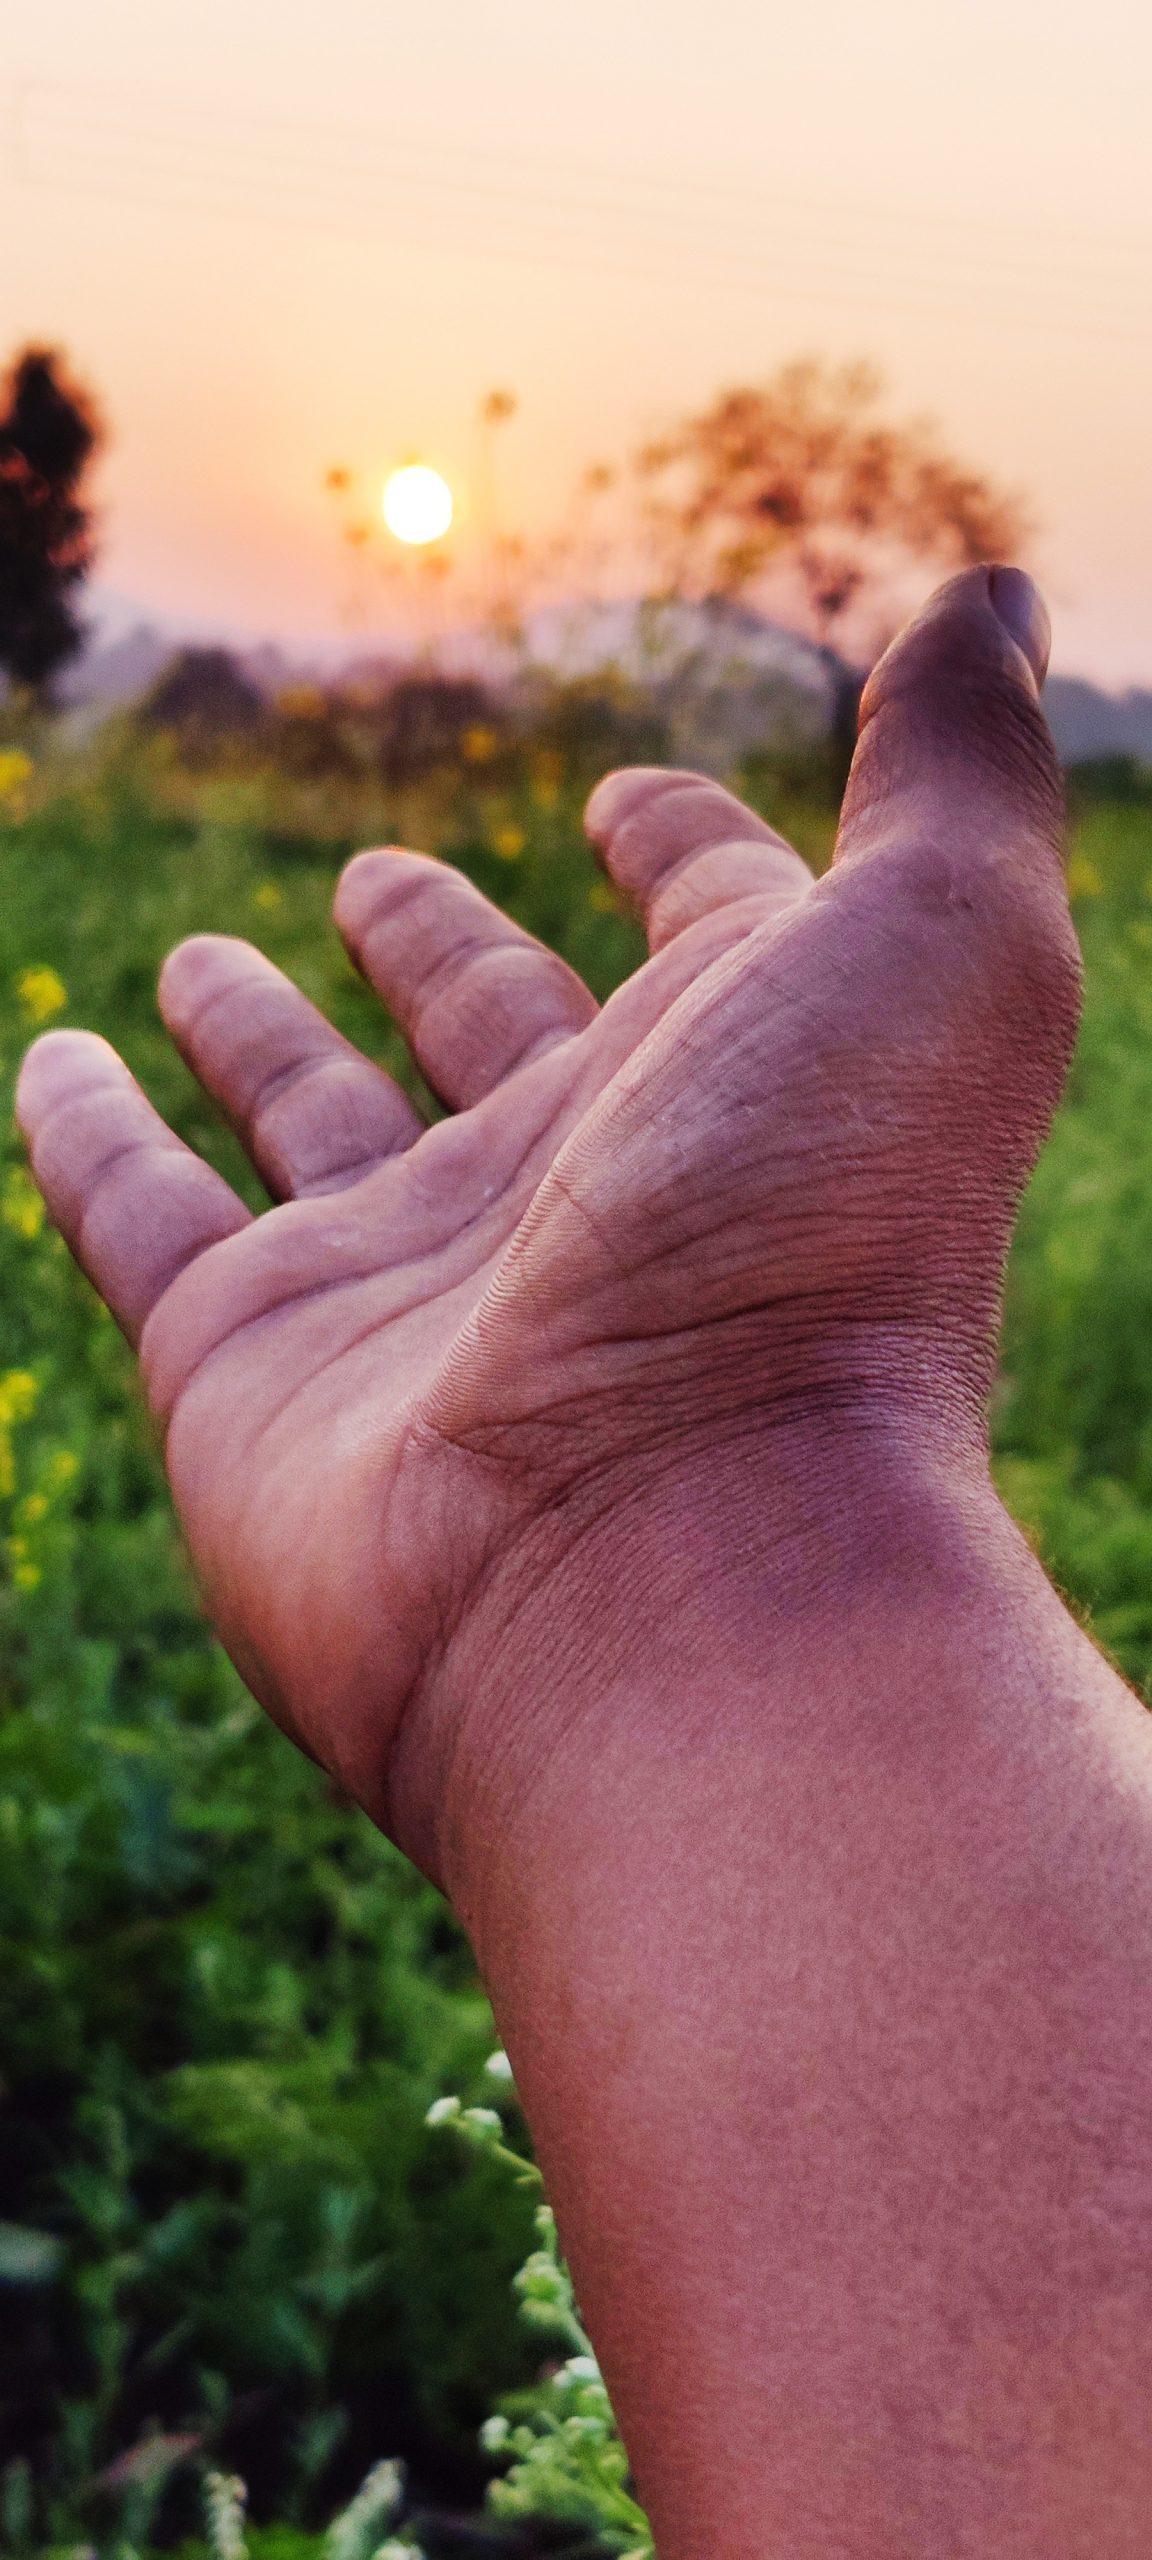 A hand towards sunset